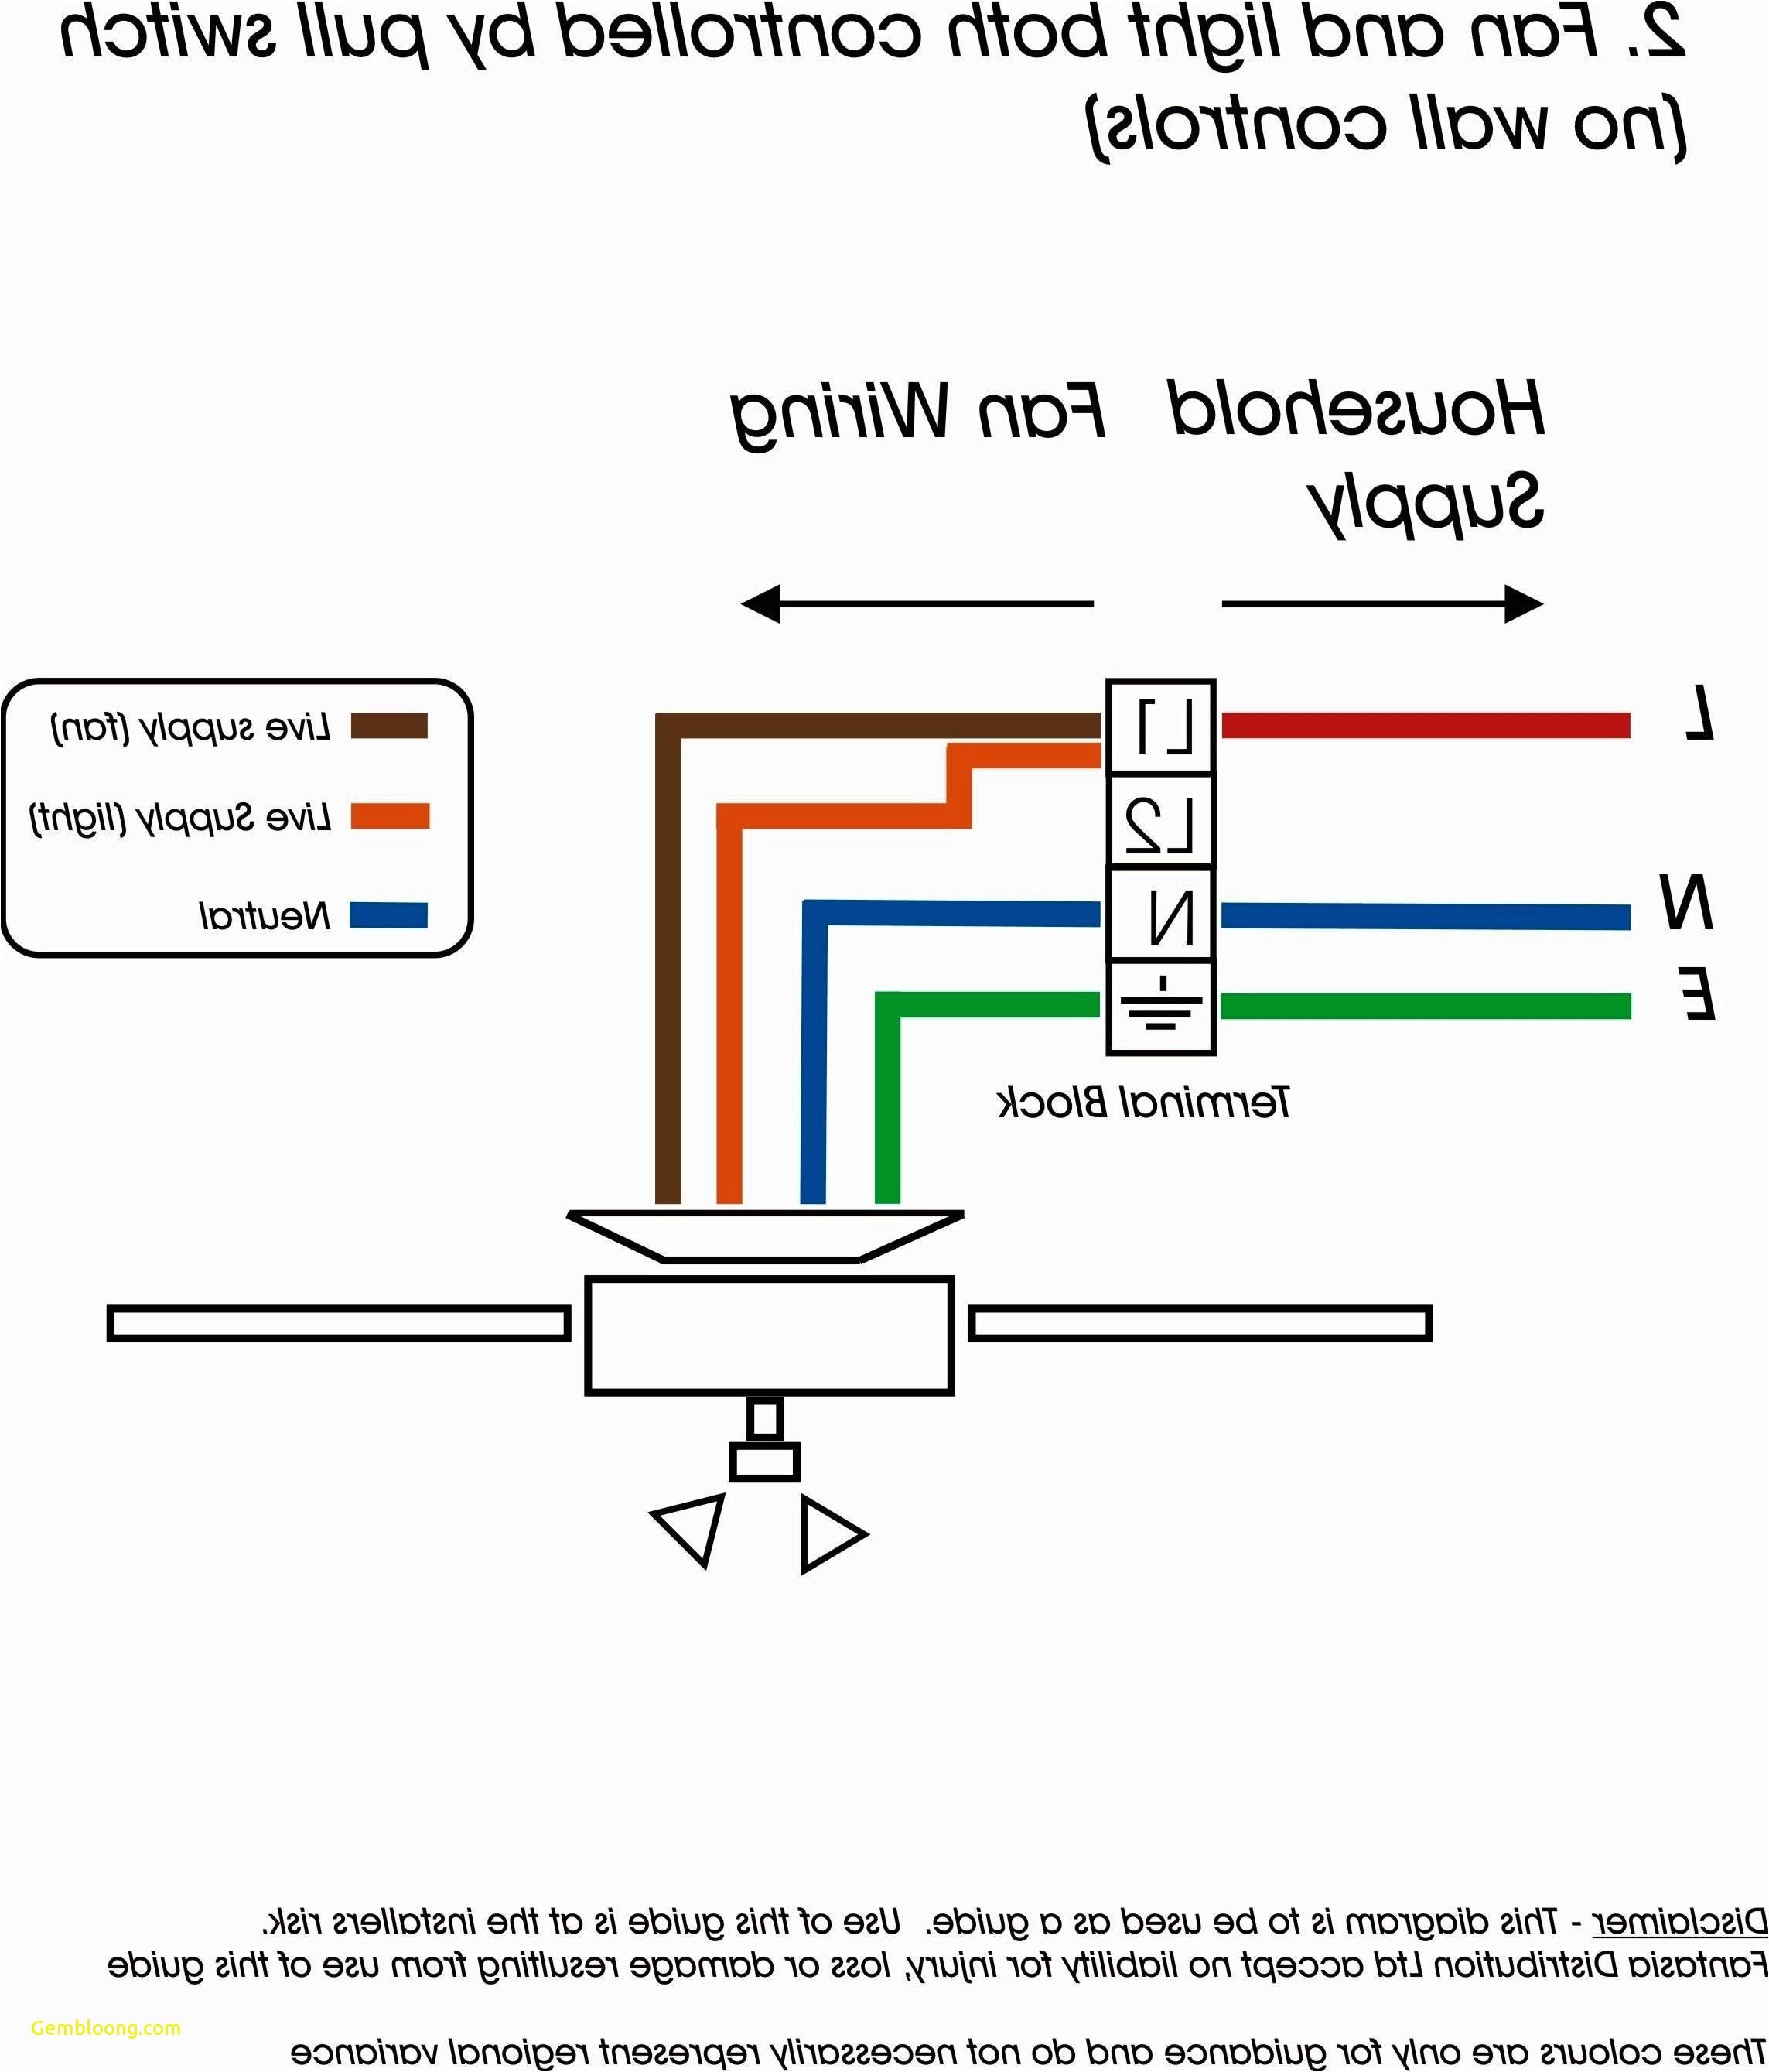 quorum ceiling fan wiring diagram data wiring diagram preview quorum ceiling fan wiring diagram use wiring